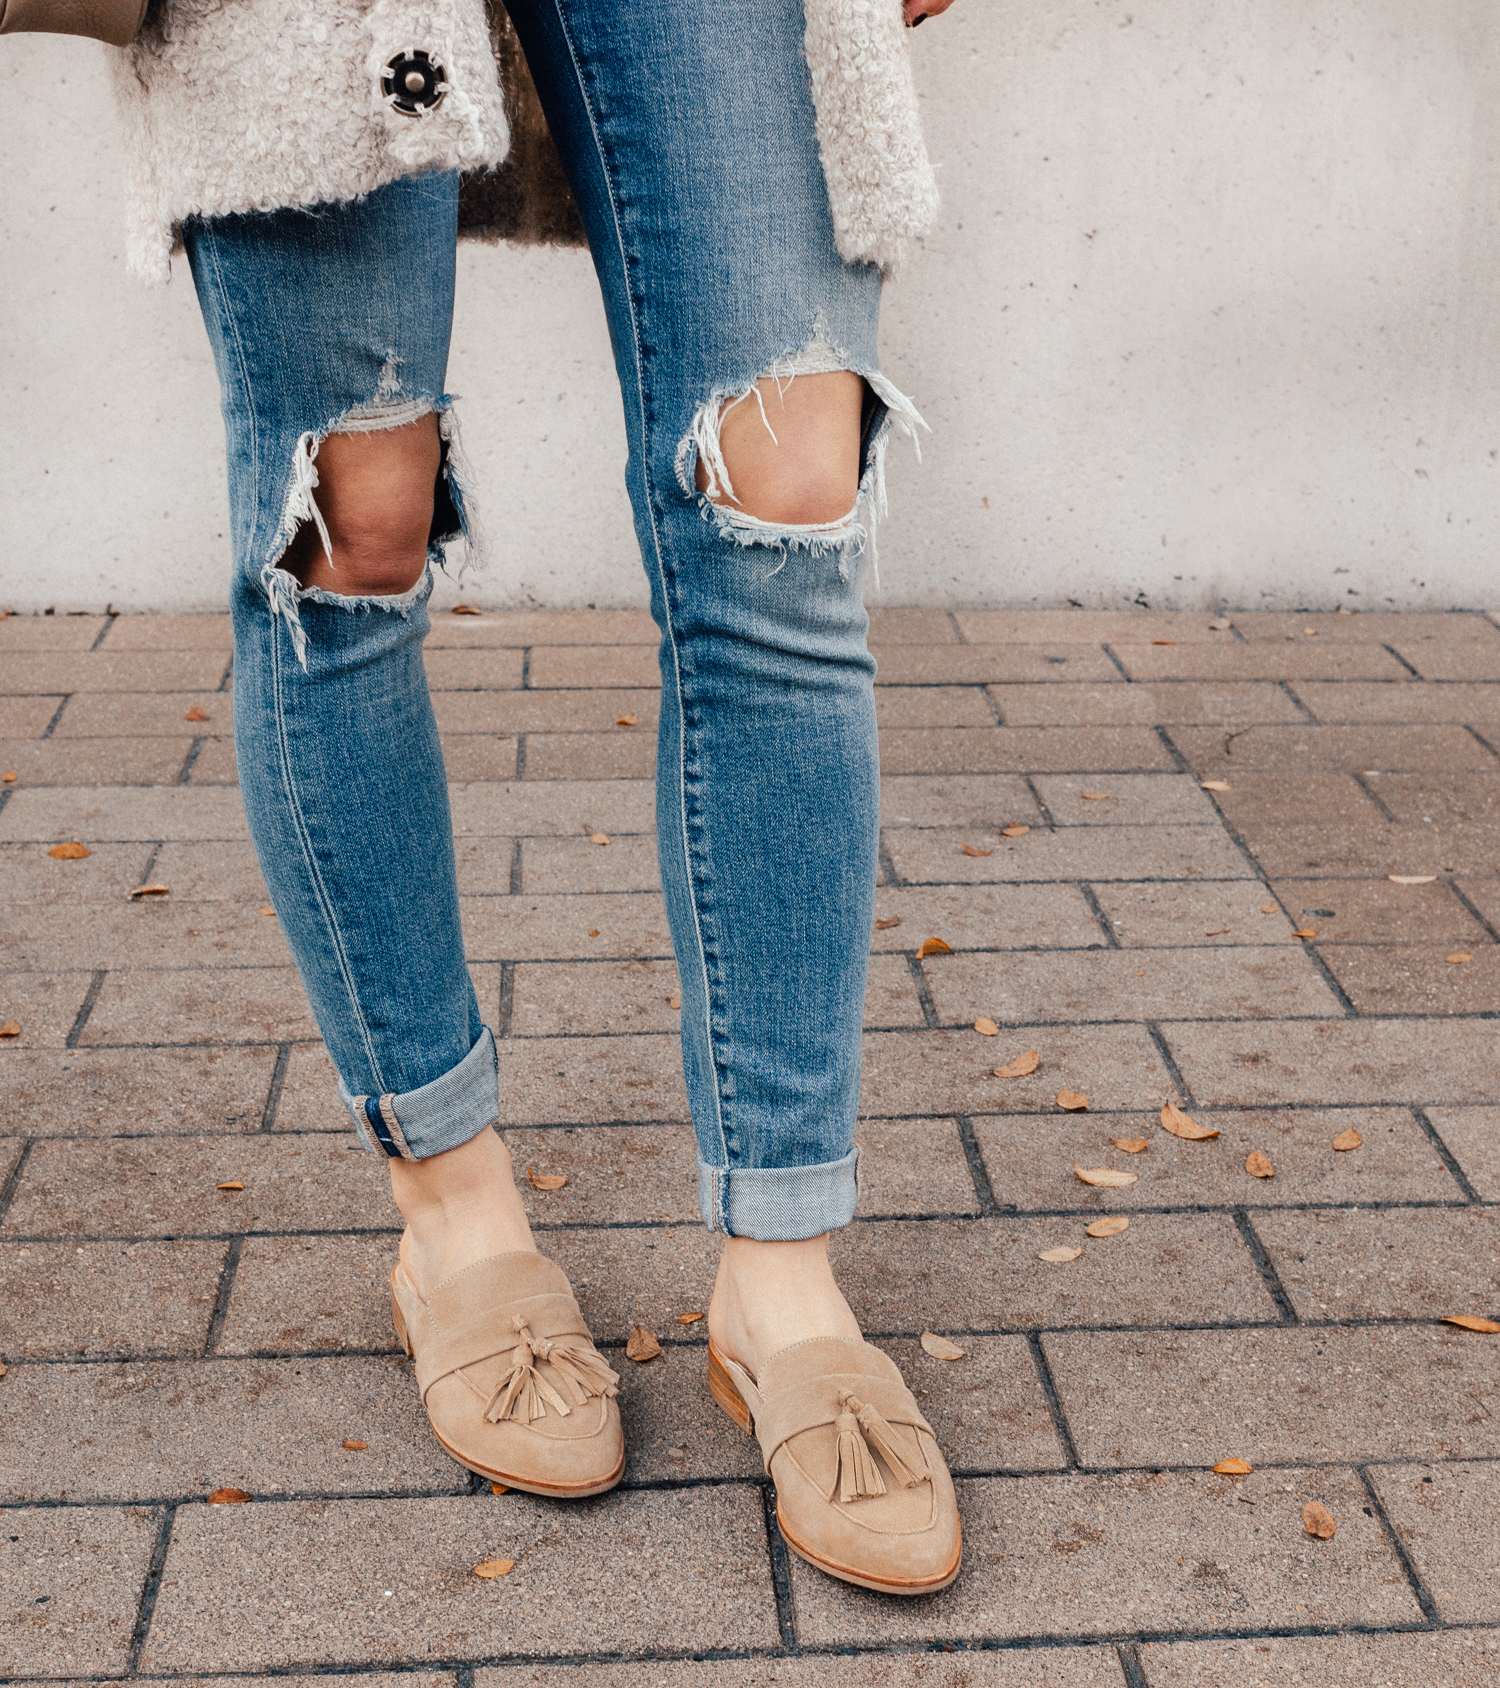 livvyland-blog-olivia-watson-free-people-blush-beige-tan-sweater-tassel-slides-cozy-layers-steve-madden